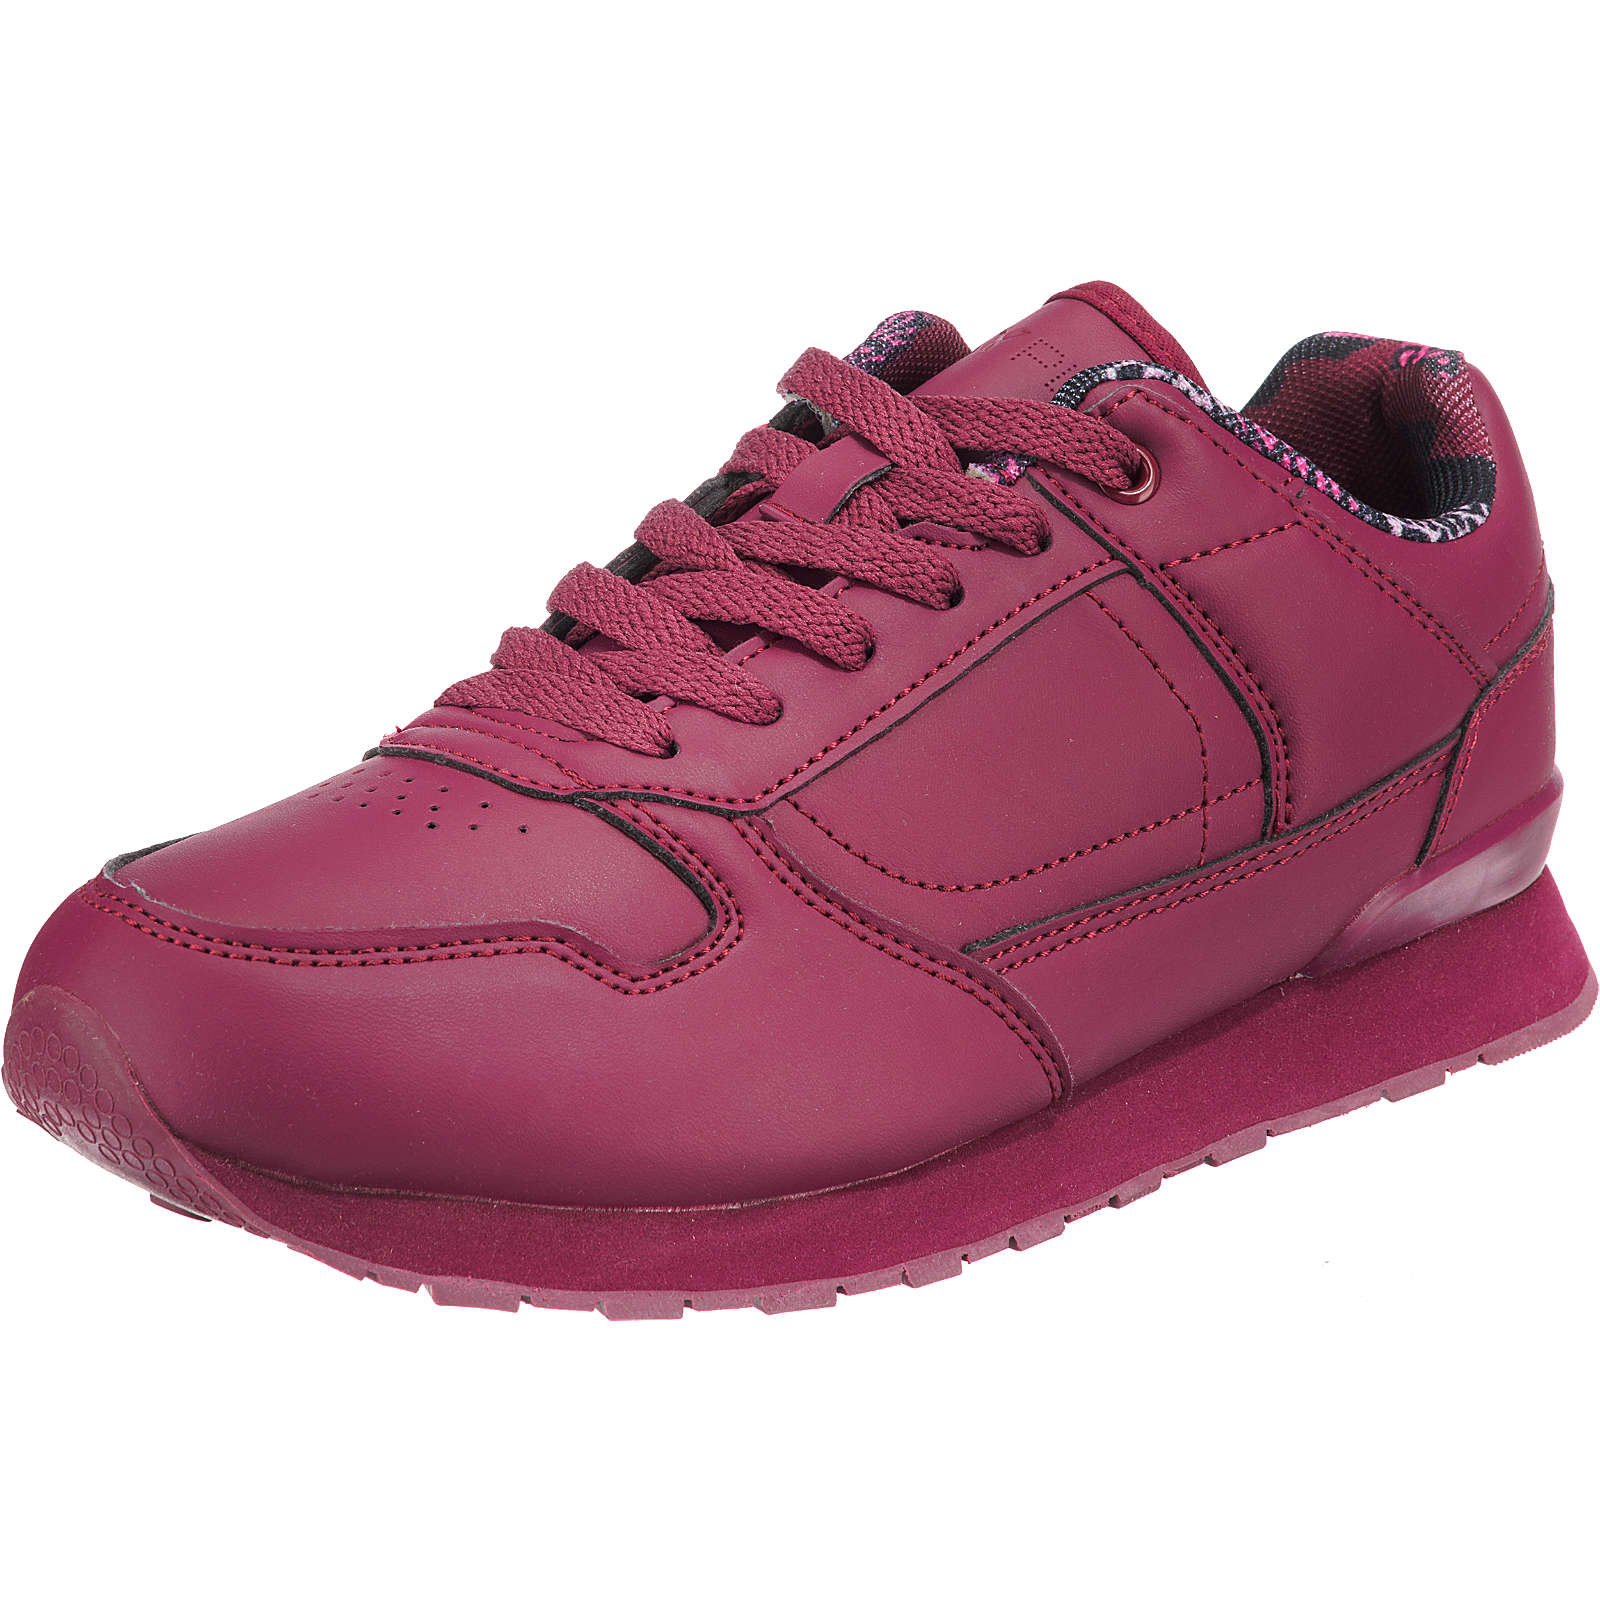 ONLY Suri Sneakers Low bordeaux Damen Gr. 38